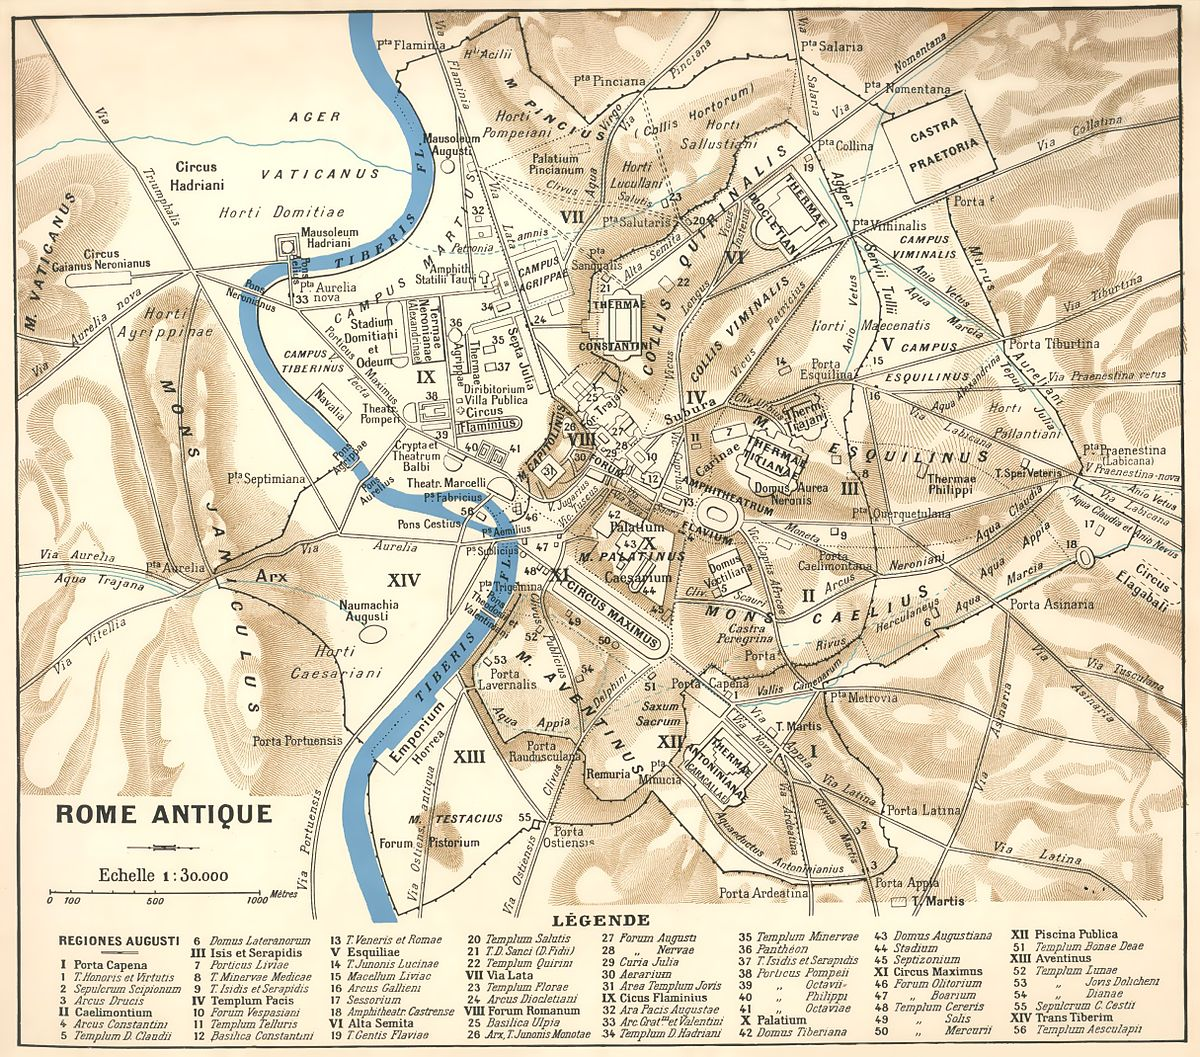 carte de rome antique File:Rome antique (larousse modf).   Wikimedia Commons